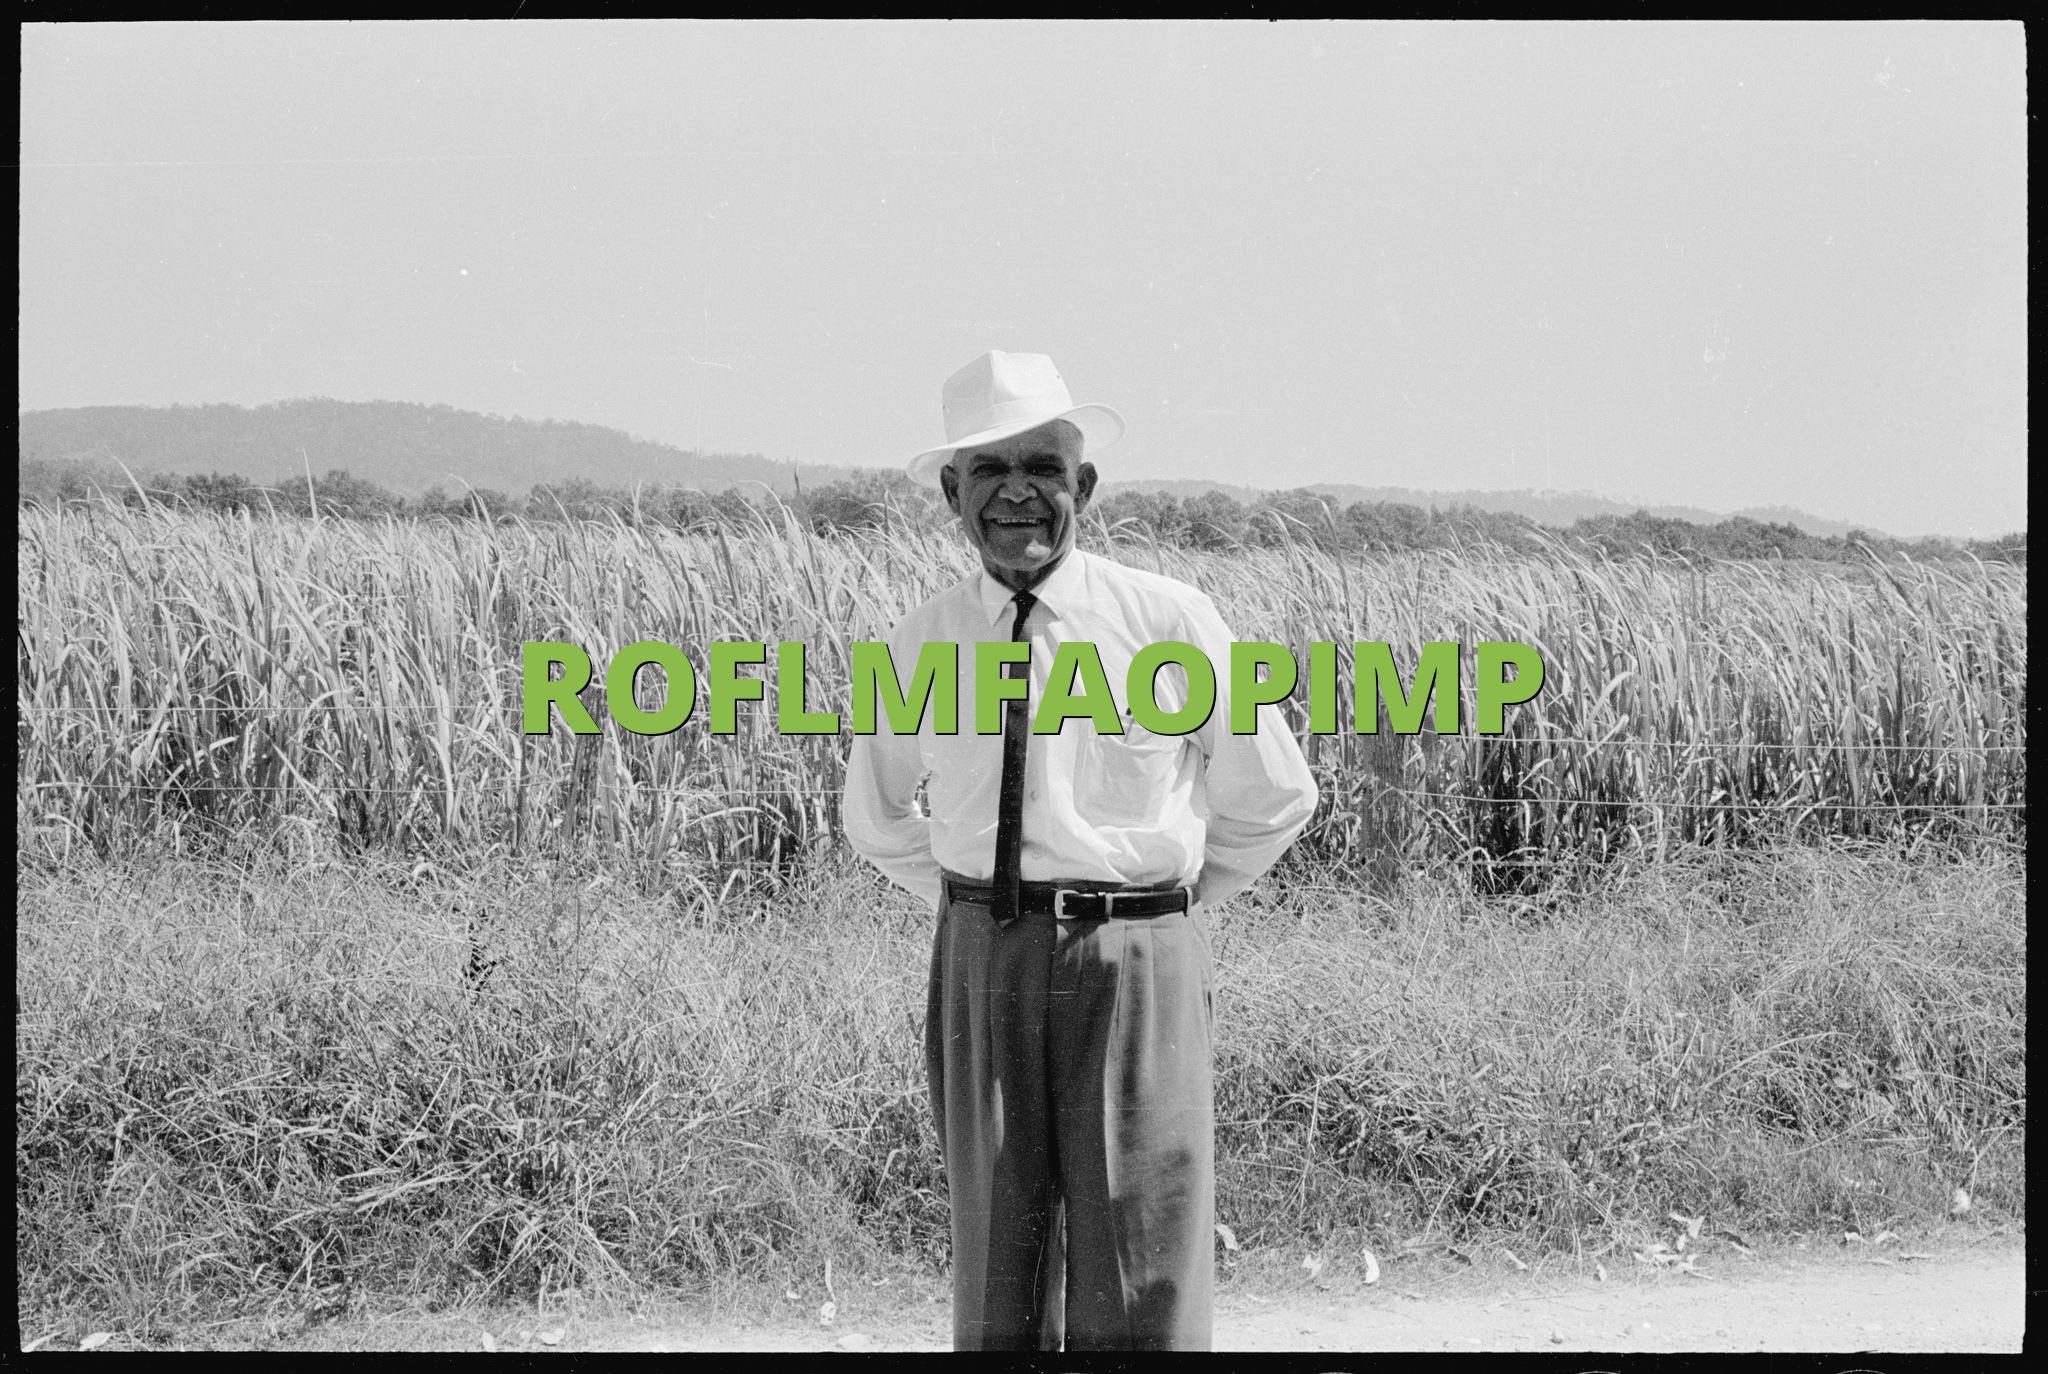 ROFLMFAOPIMP